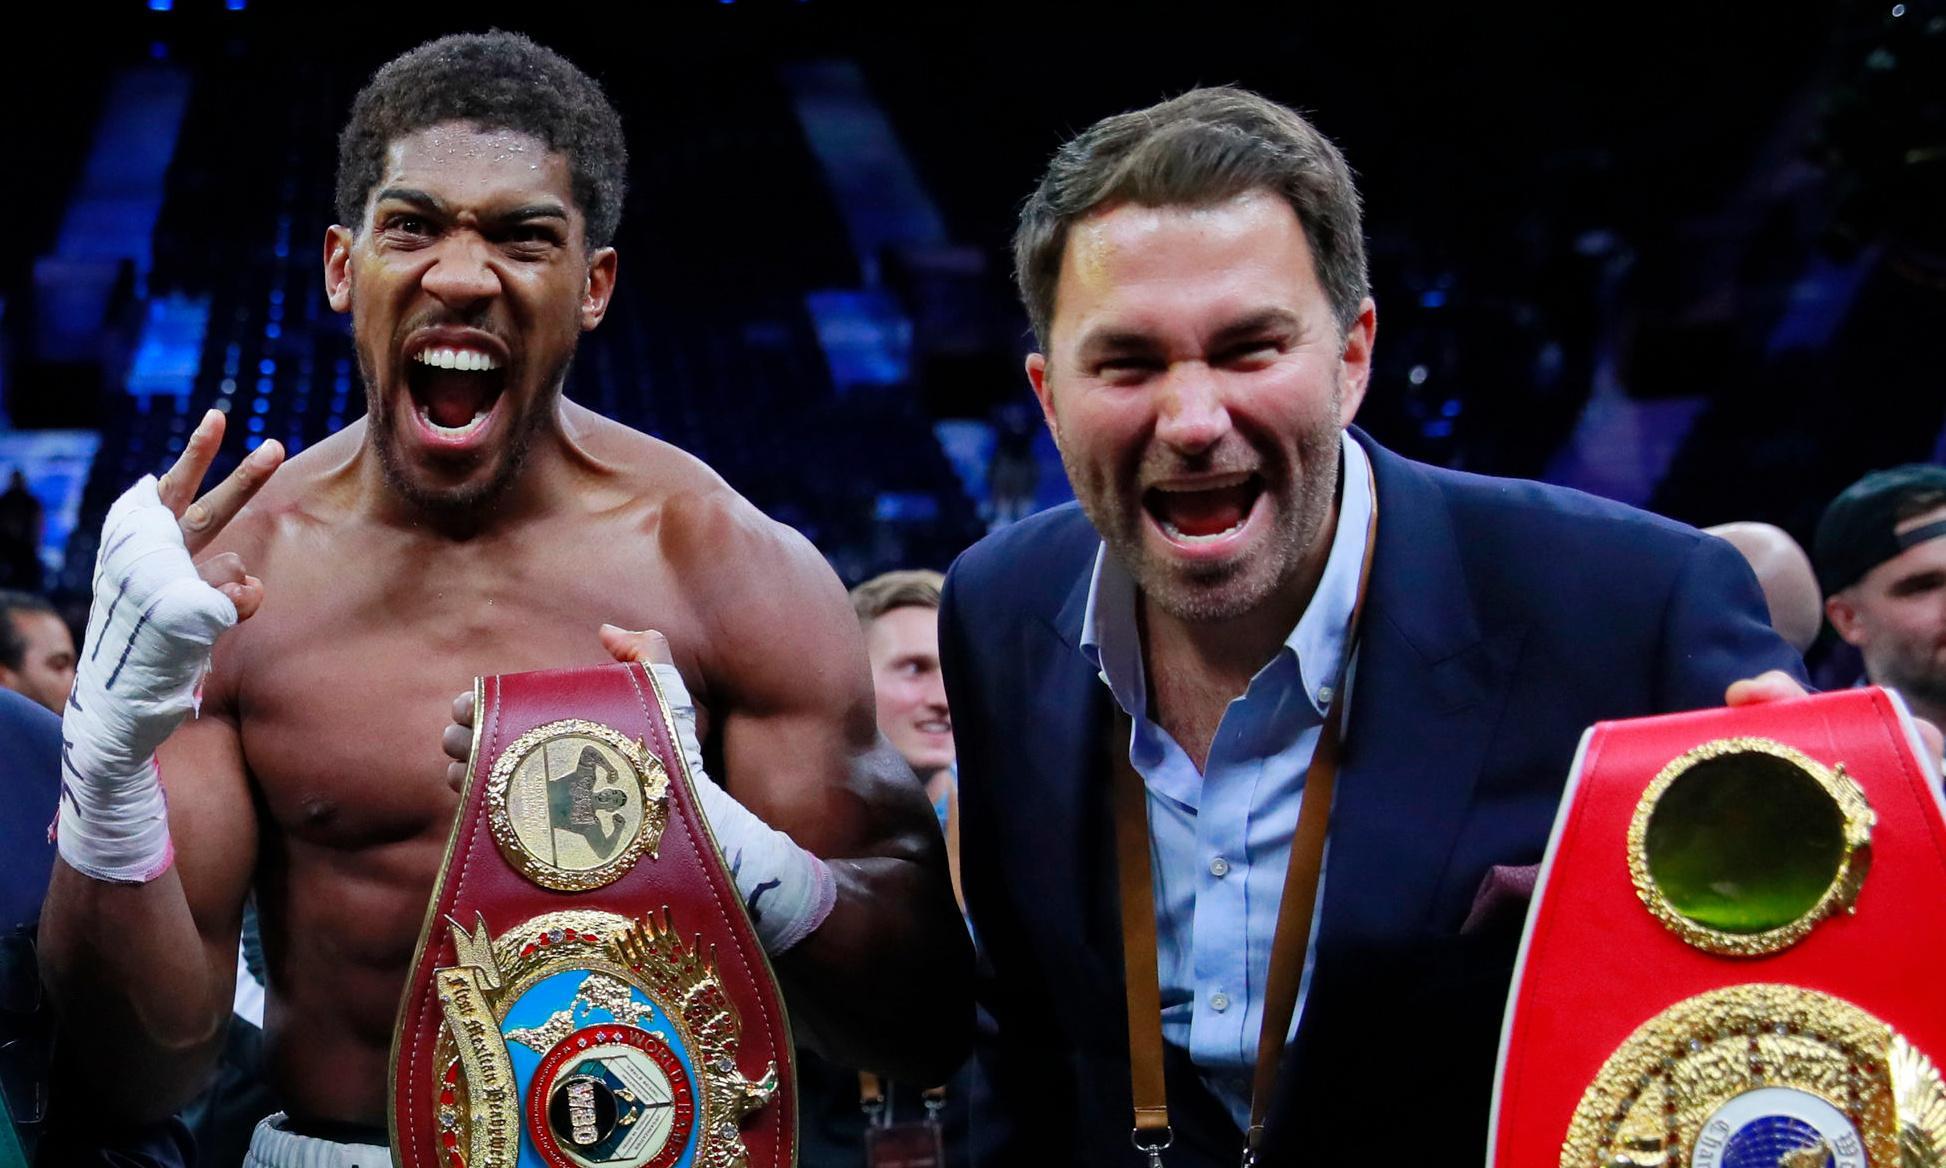 Anthony Joshua would be underdog against Tyson Fury, says Eddie Hearn